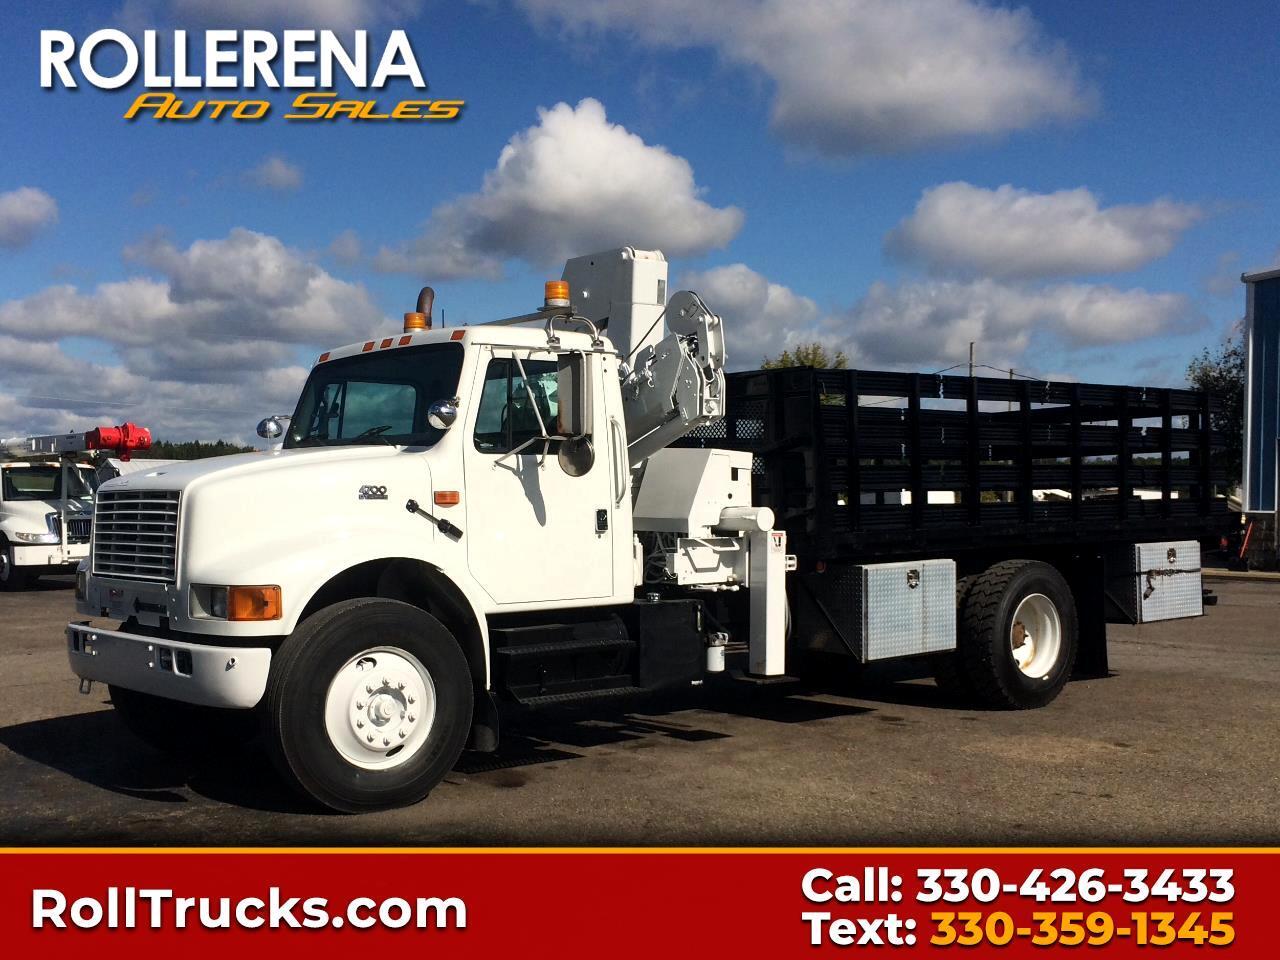 2001 International 4700 Crane Truck